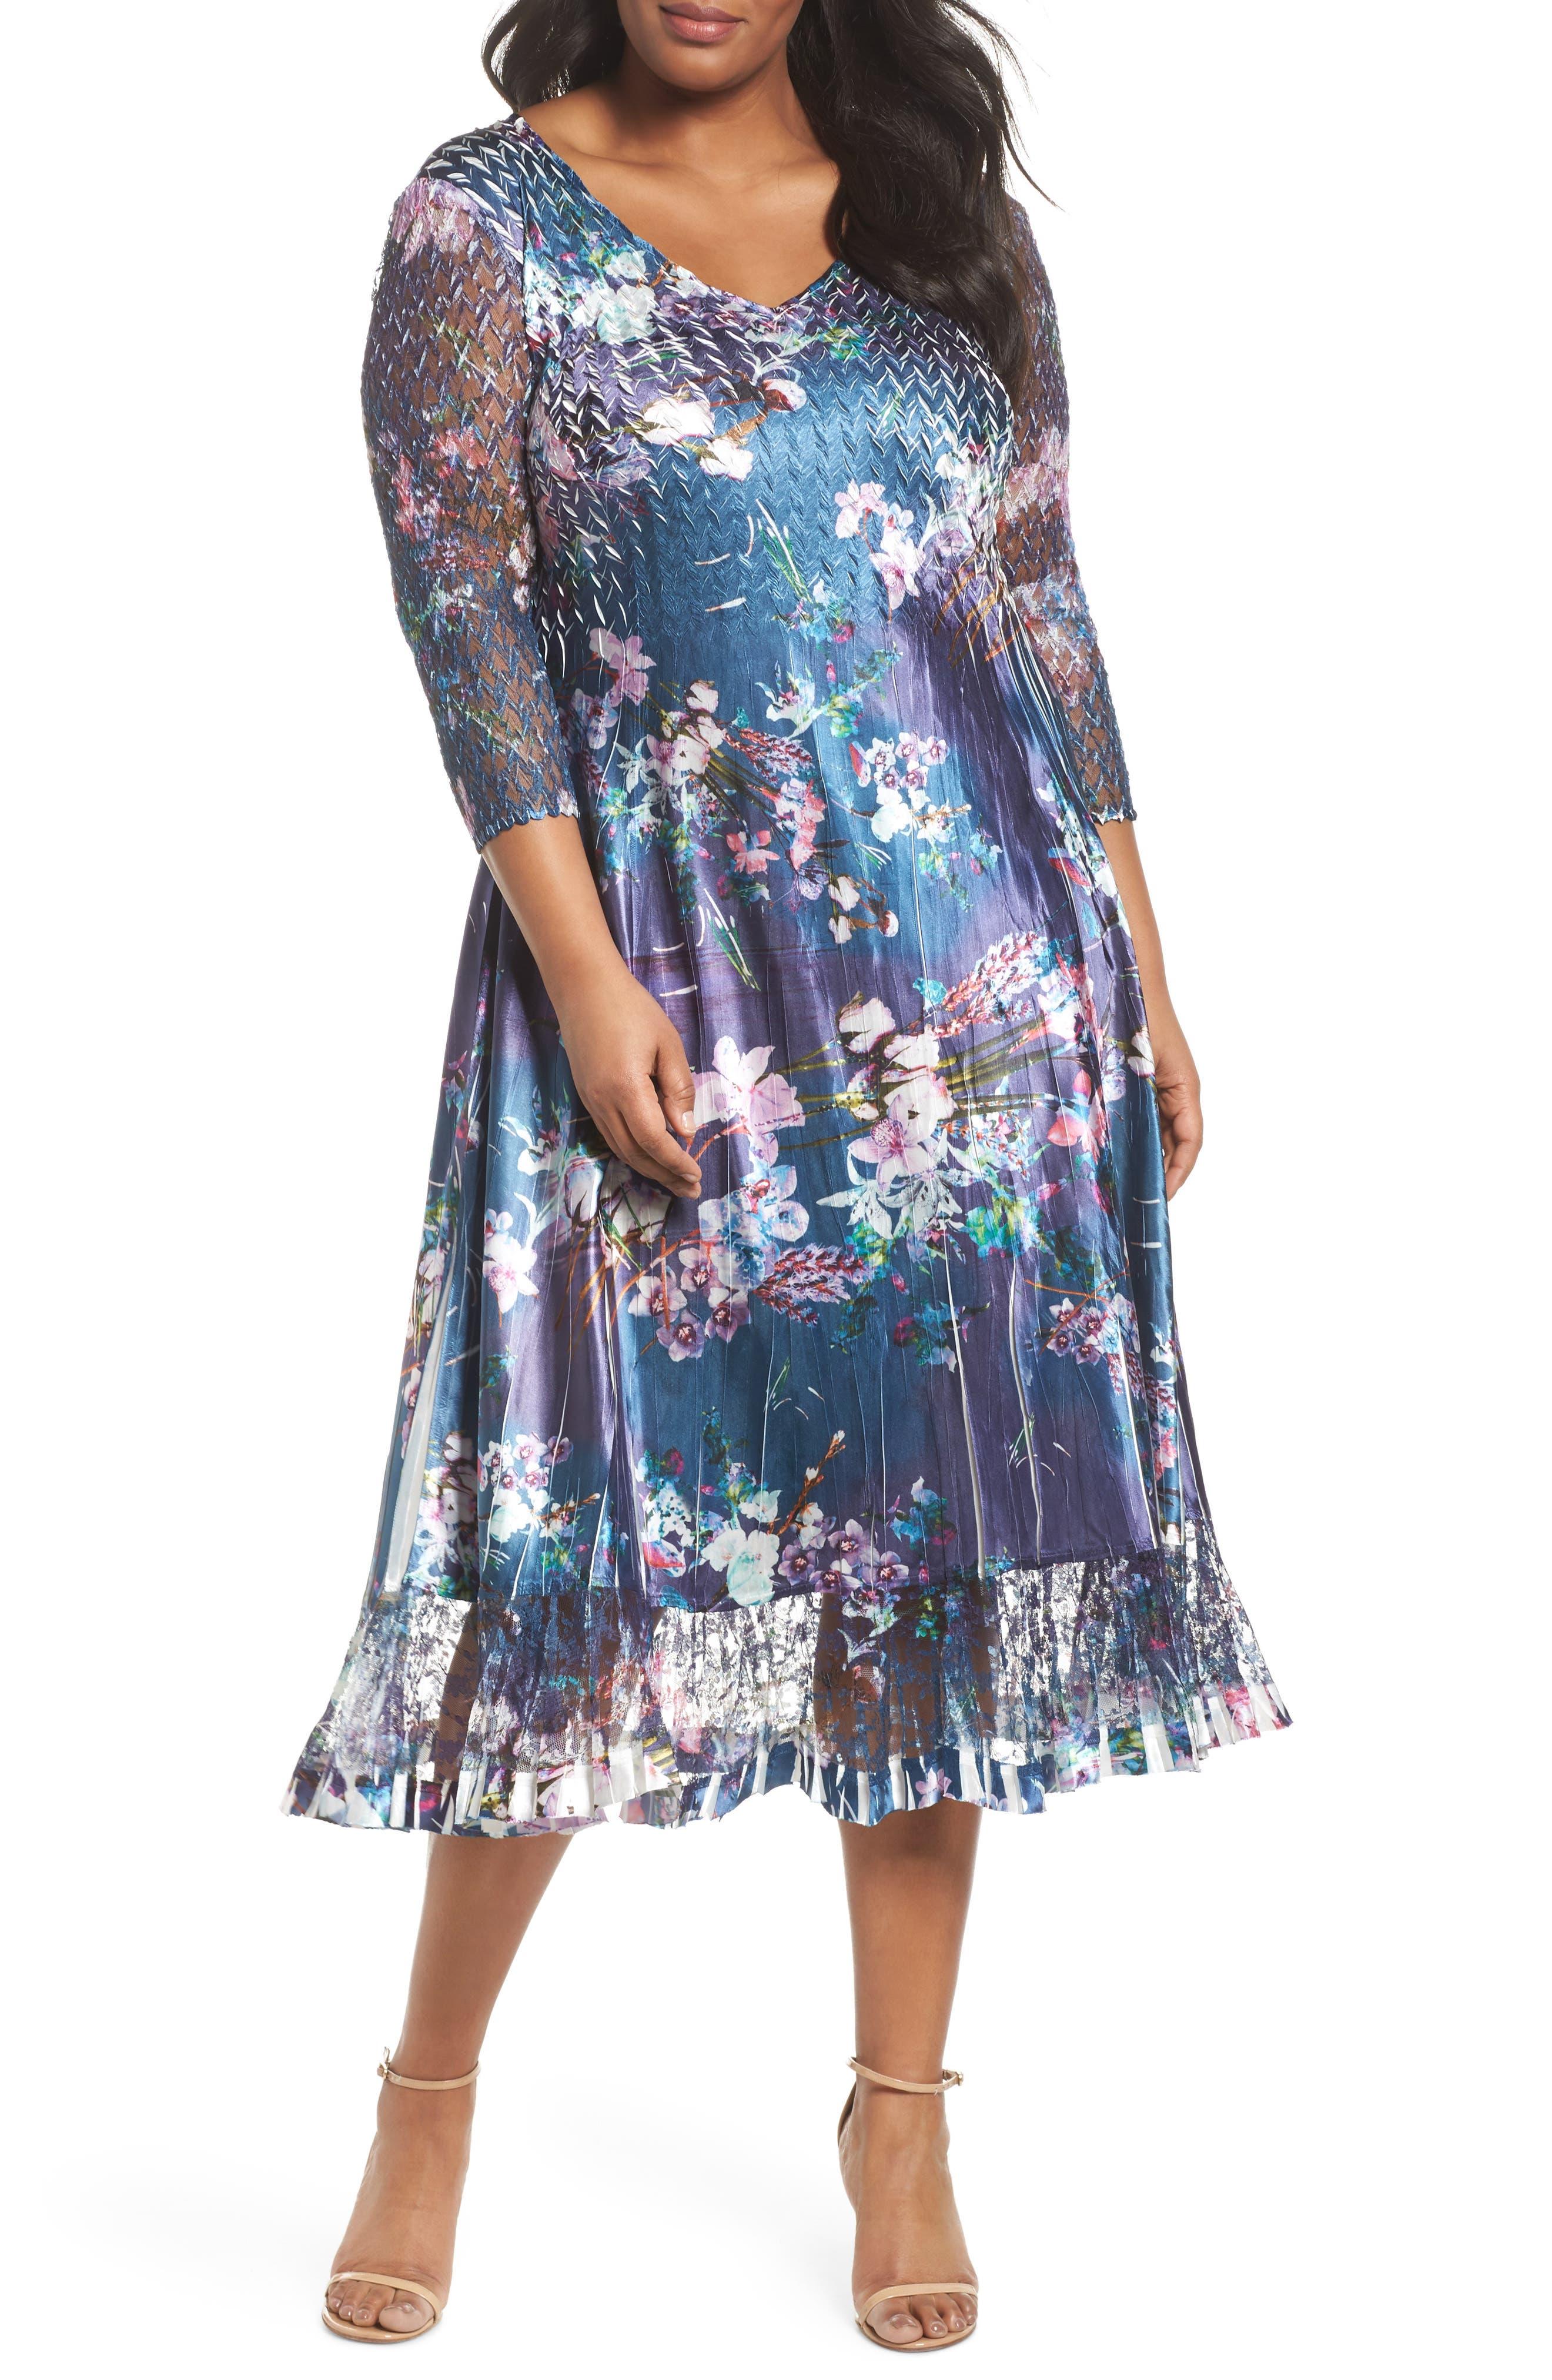 Turquoise Plus Size Cocktail Dresses